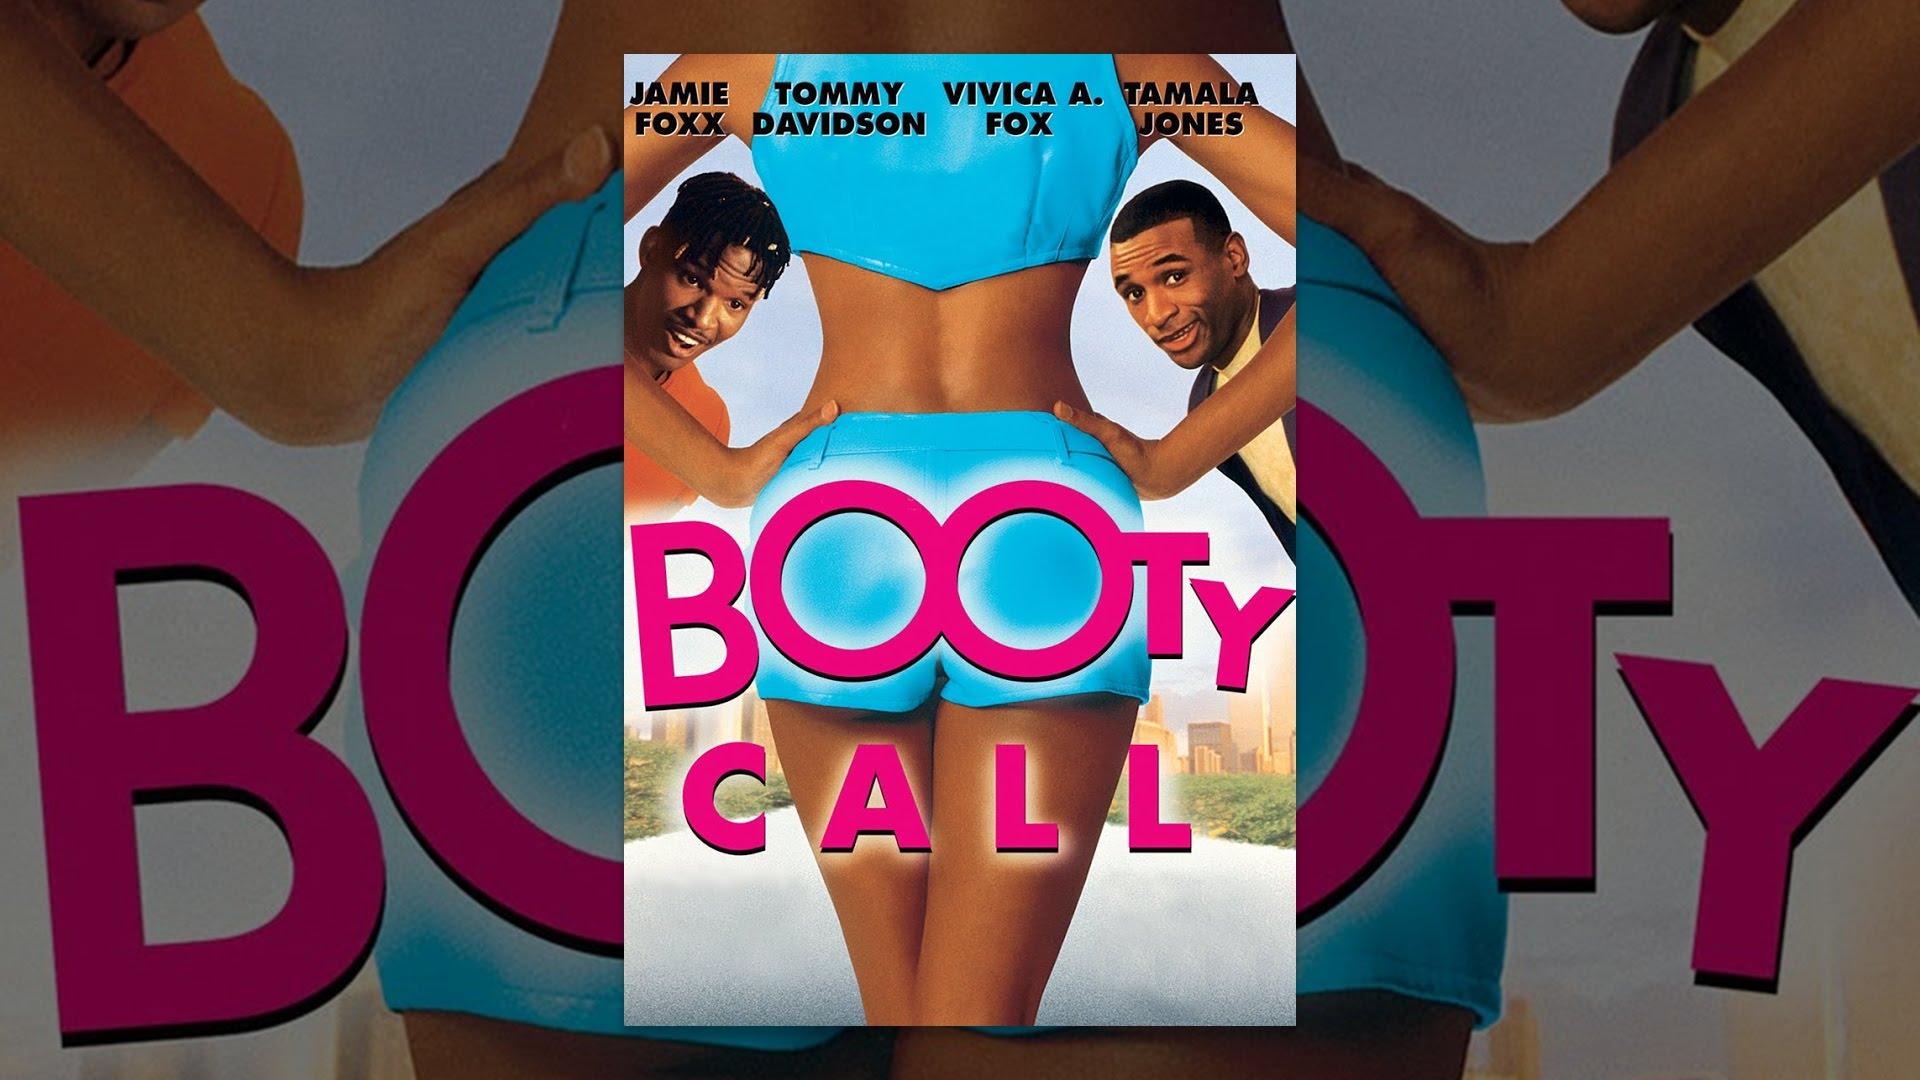 call booty call